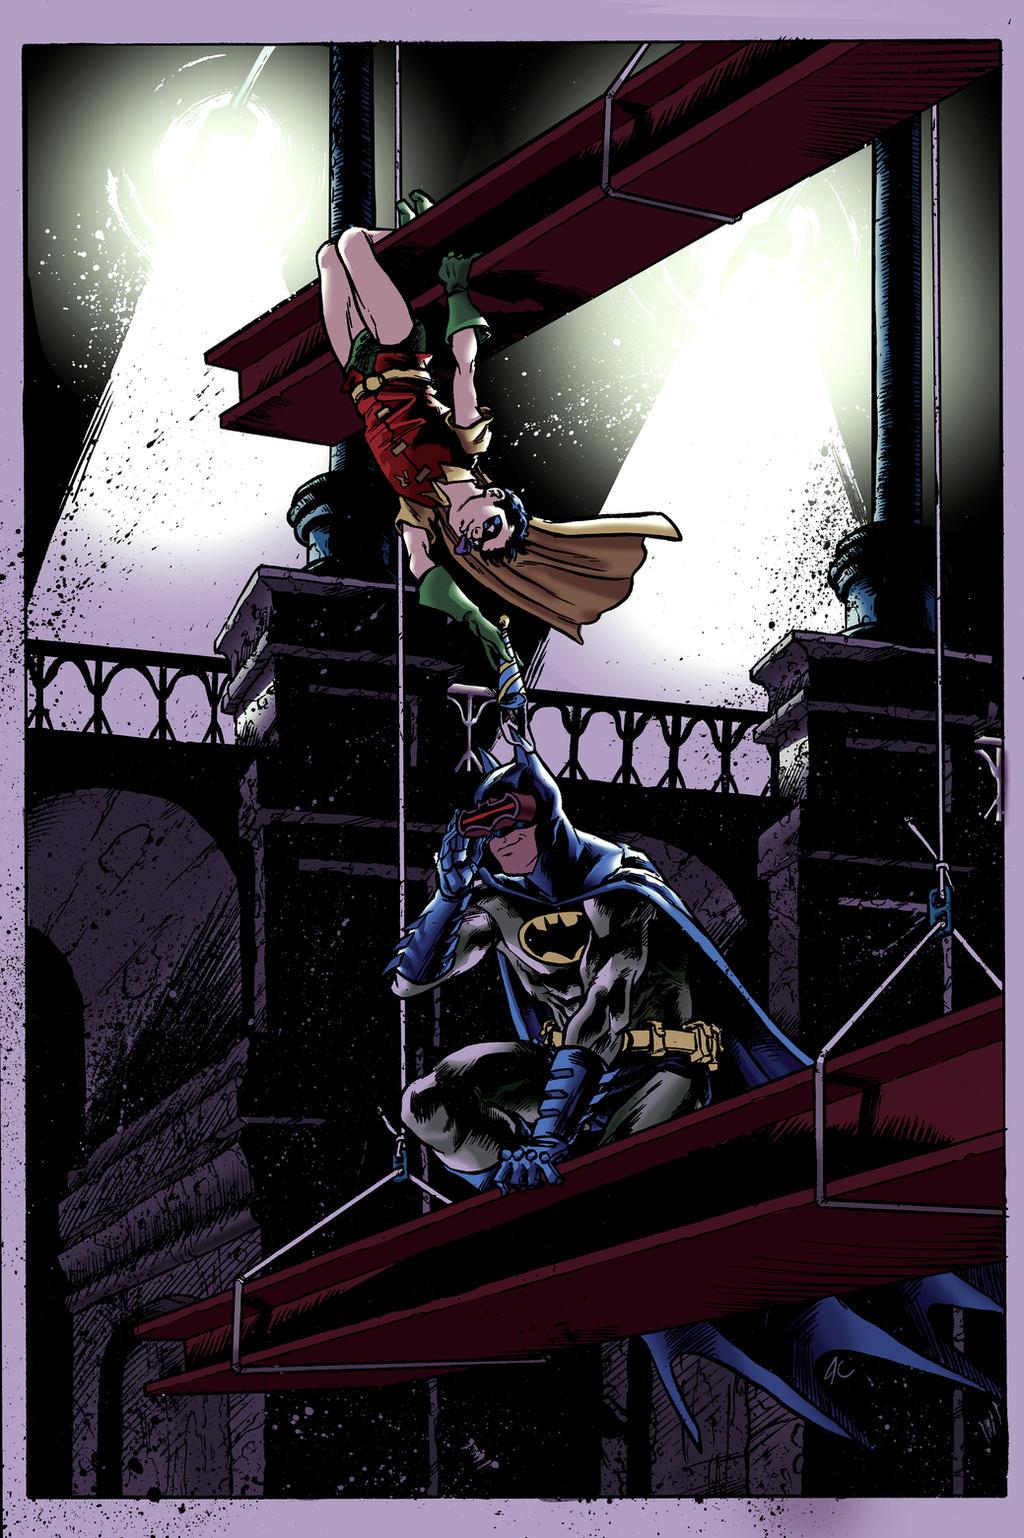 Batman 75th Anniversary by jciolli